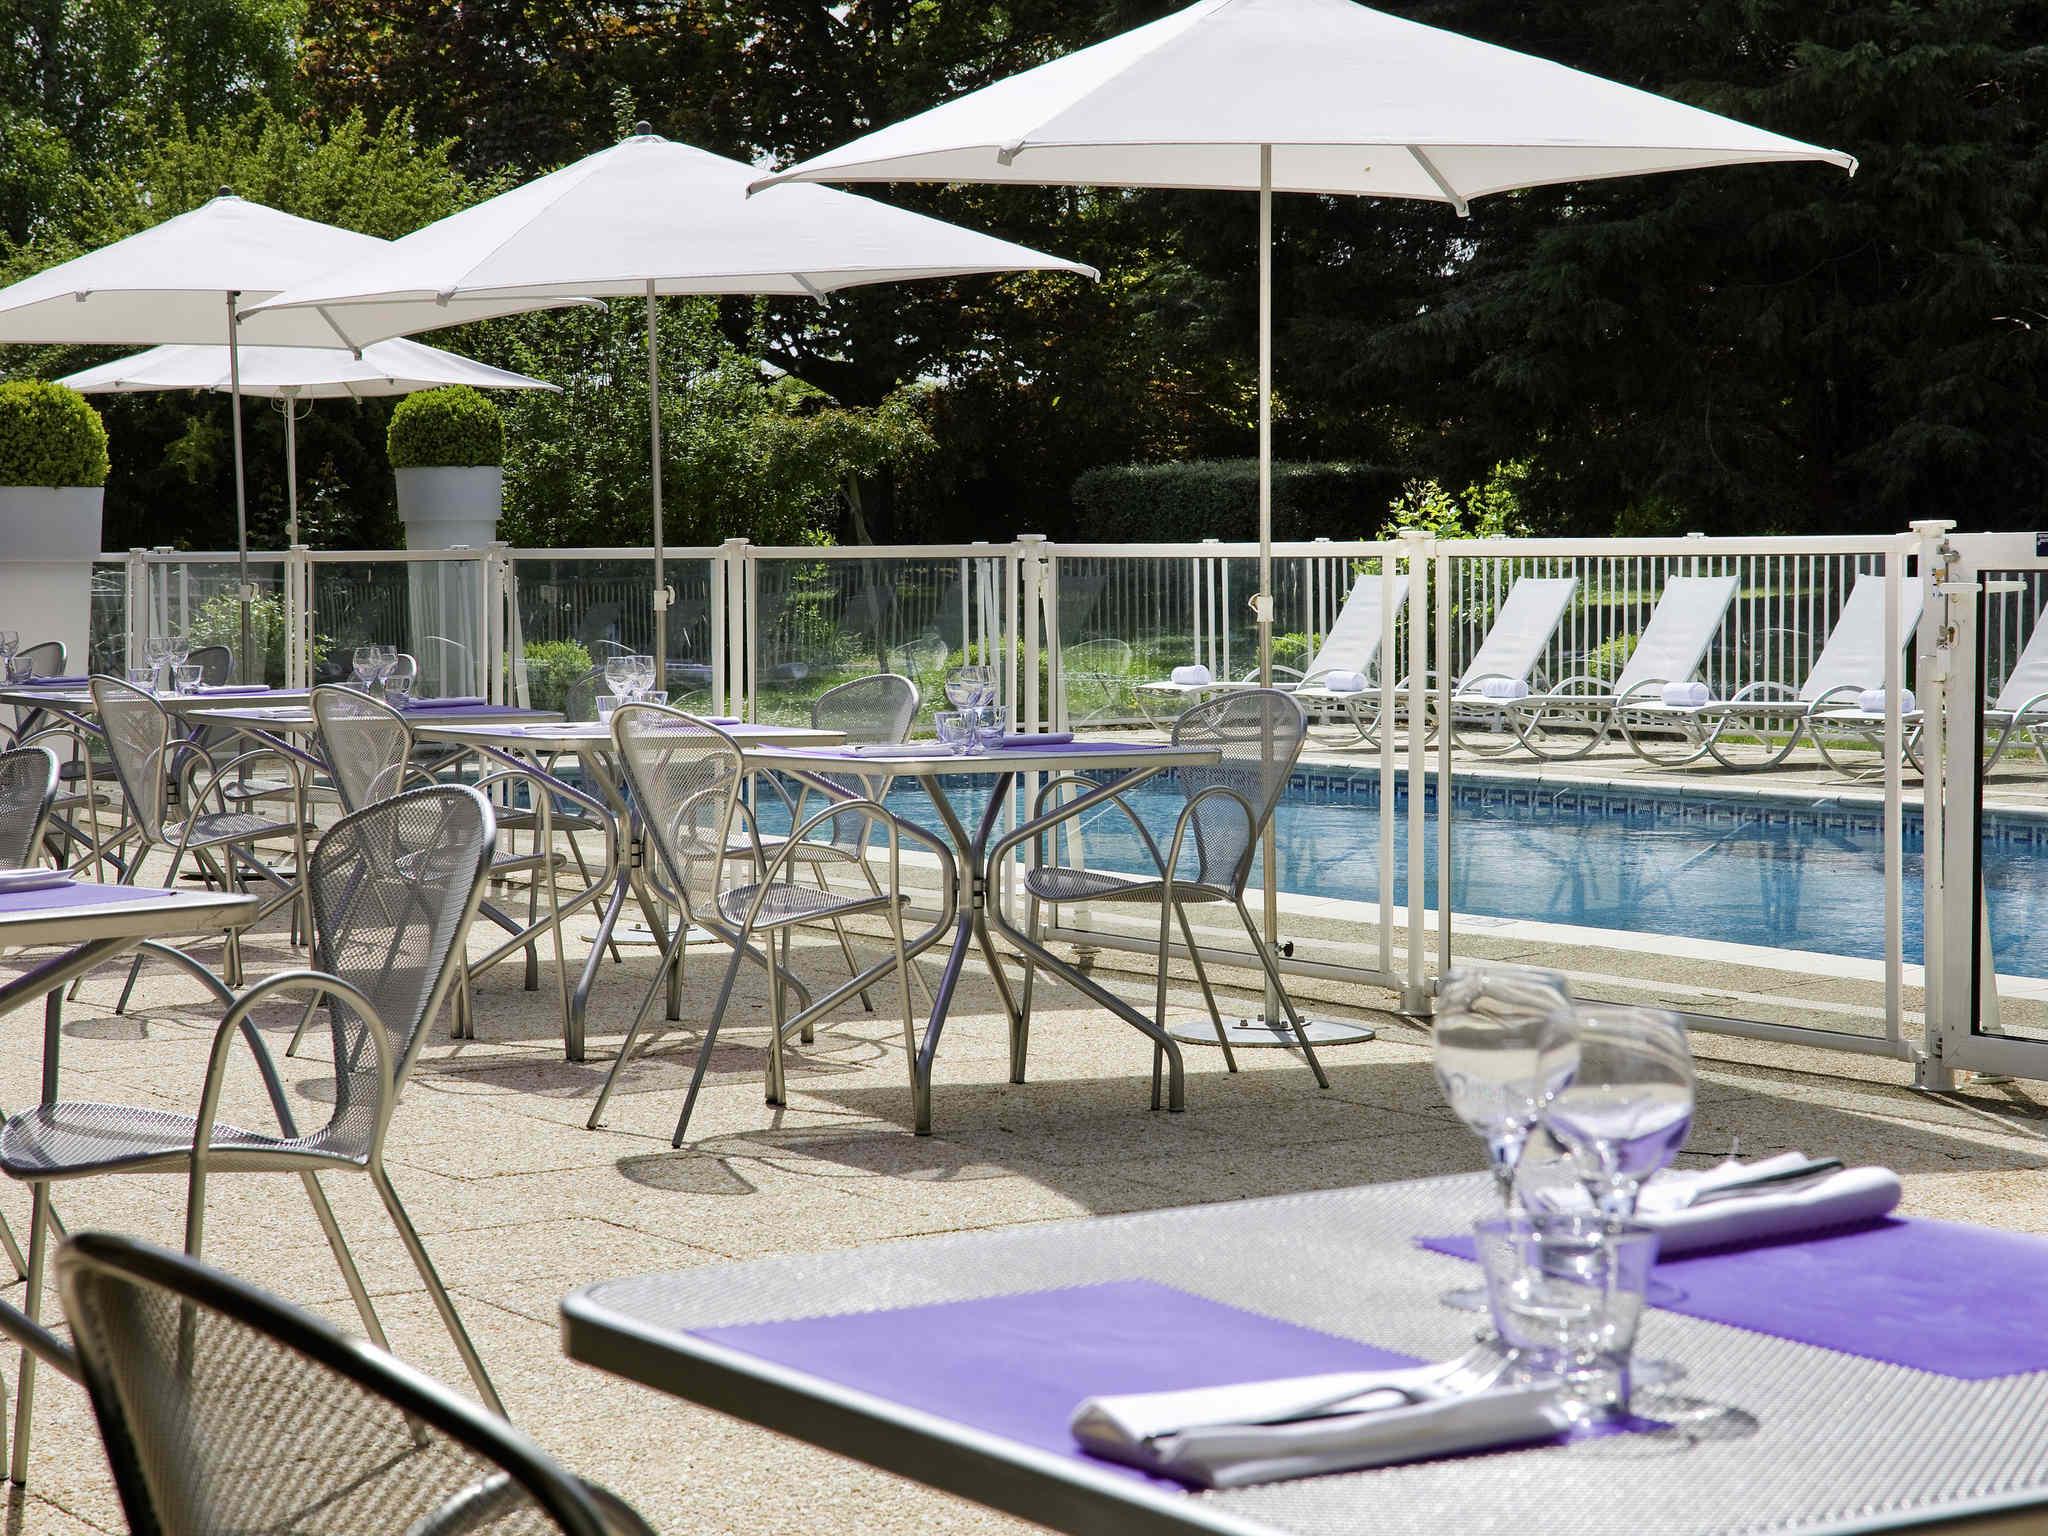 Hotel – Novotel Marne la Vallée Noisy le Grand